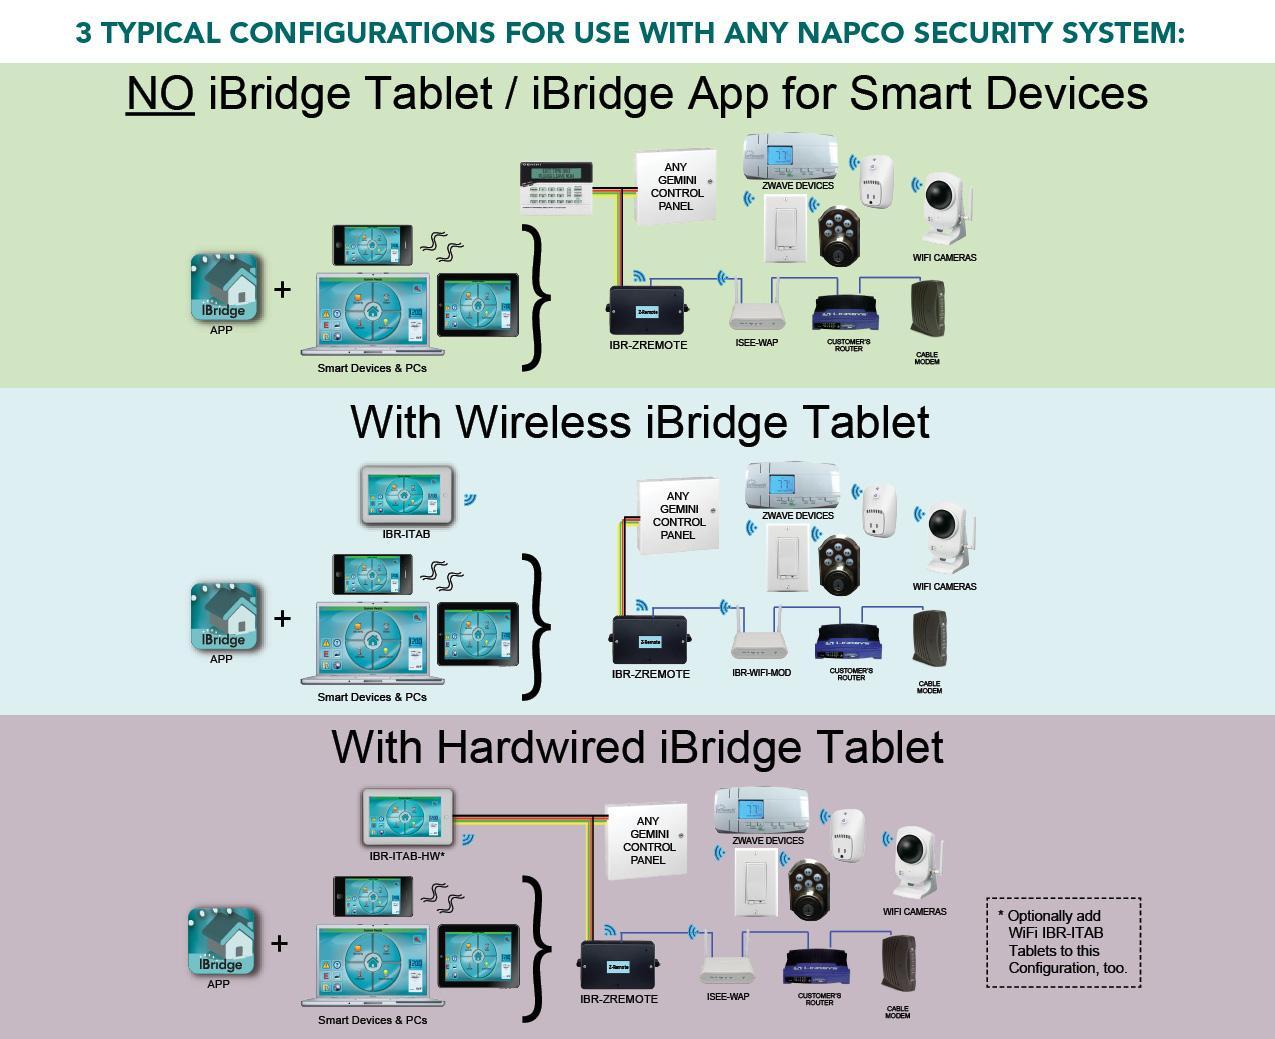 napco burglar alarm system diagram printable basketball court diagrams for plays z wave device support module